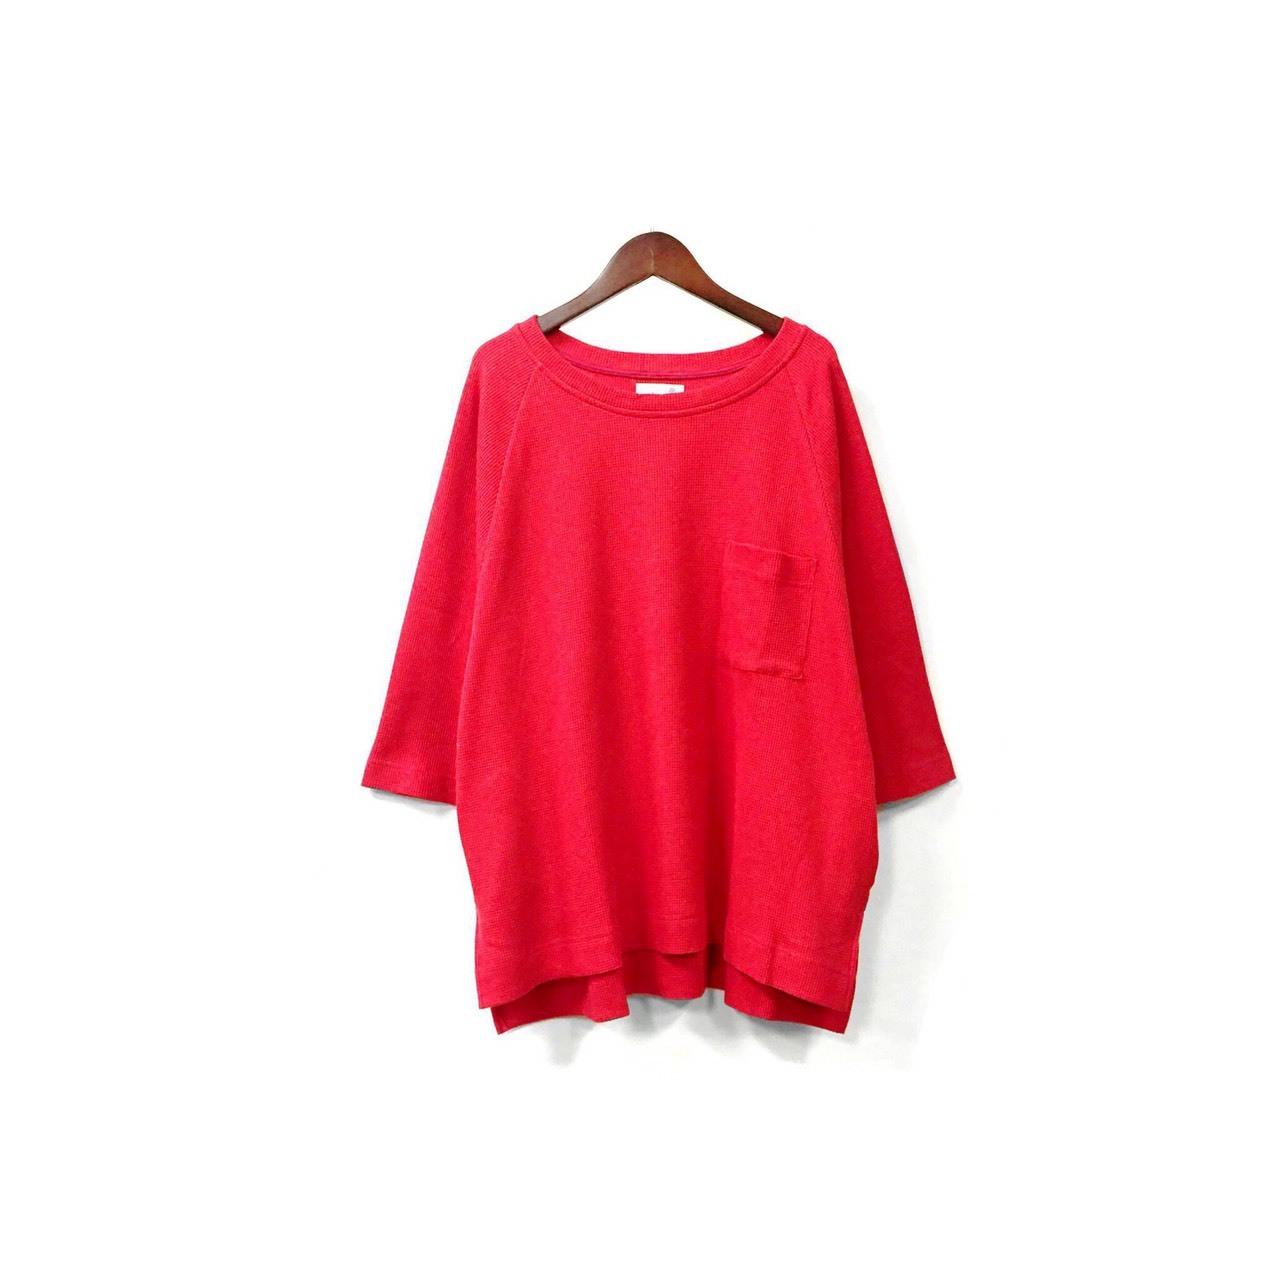 yotsuba - Thermal Tops / Red ¥11000+tax